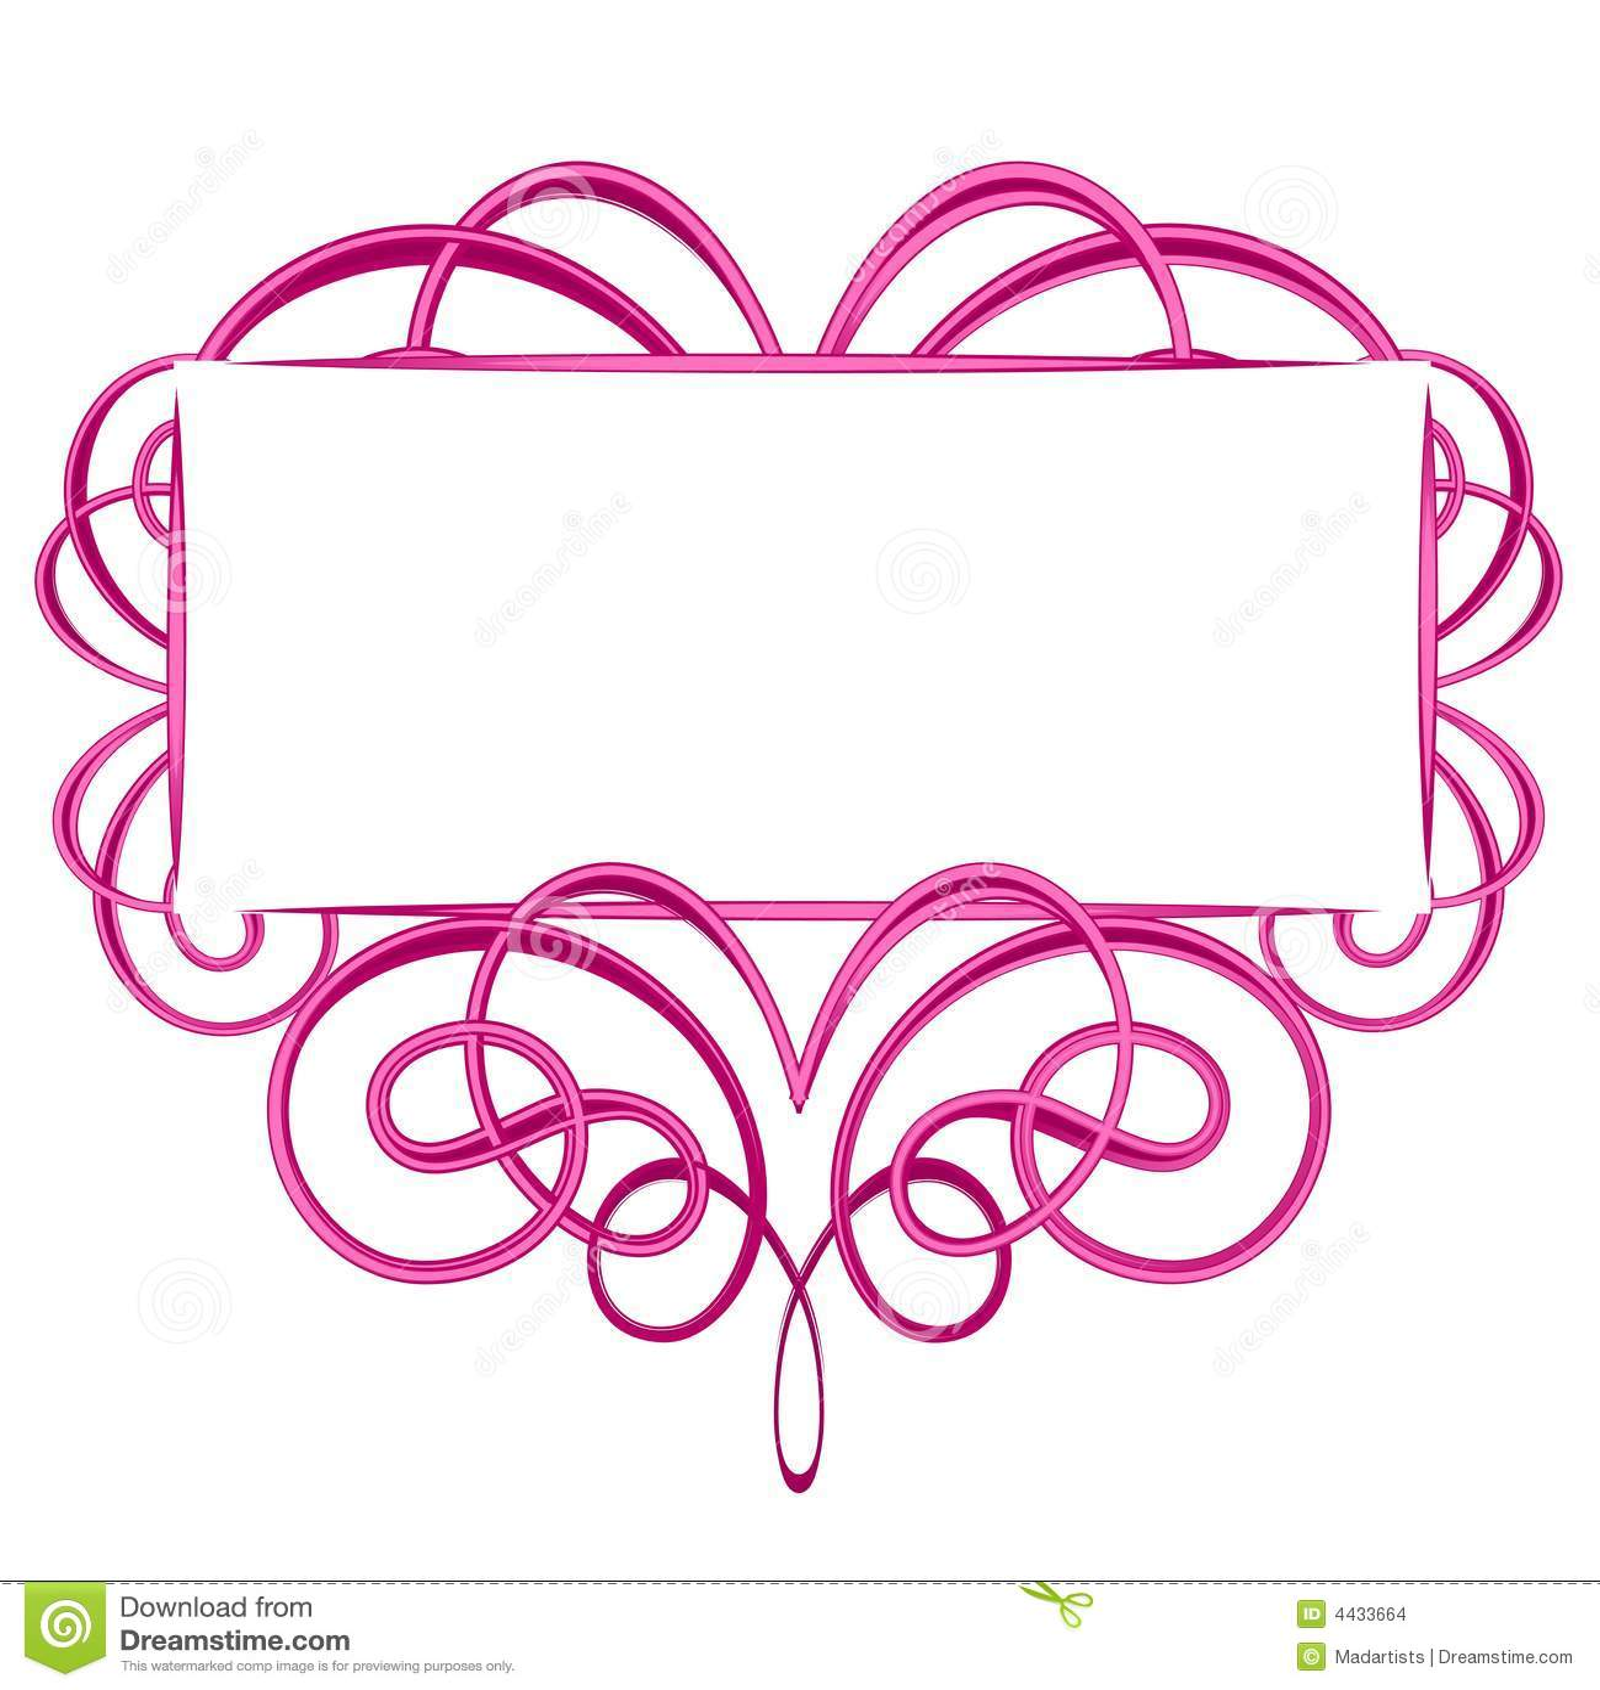 Feminine Logo Collections Template: Decorative Pink Flourish Logo Stock Images